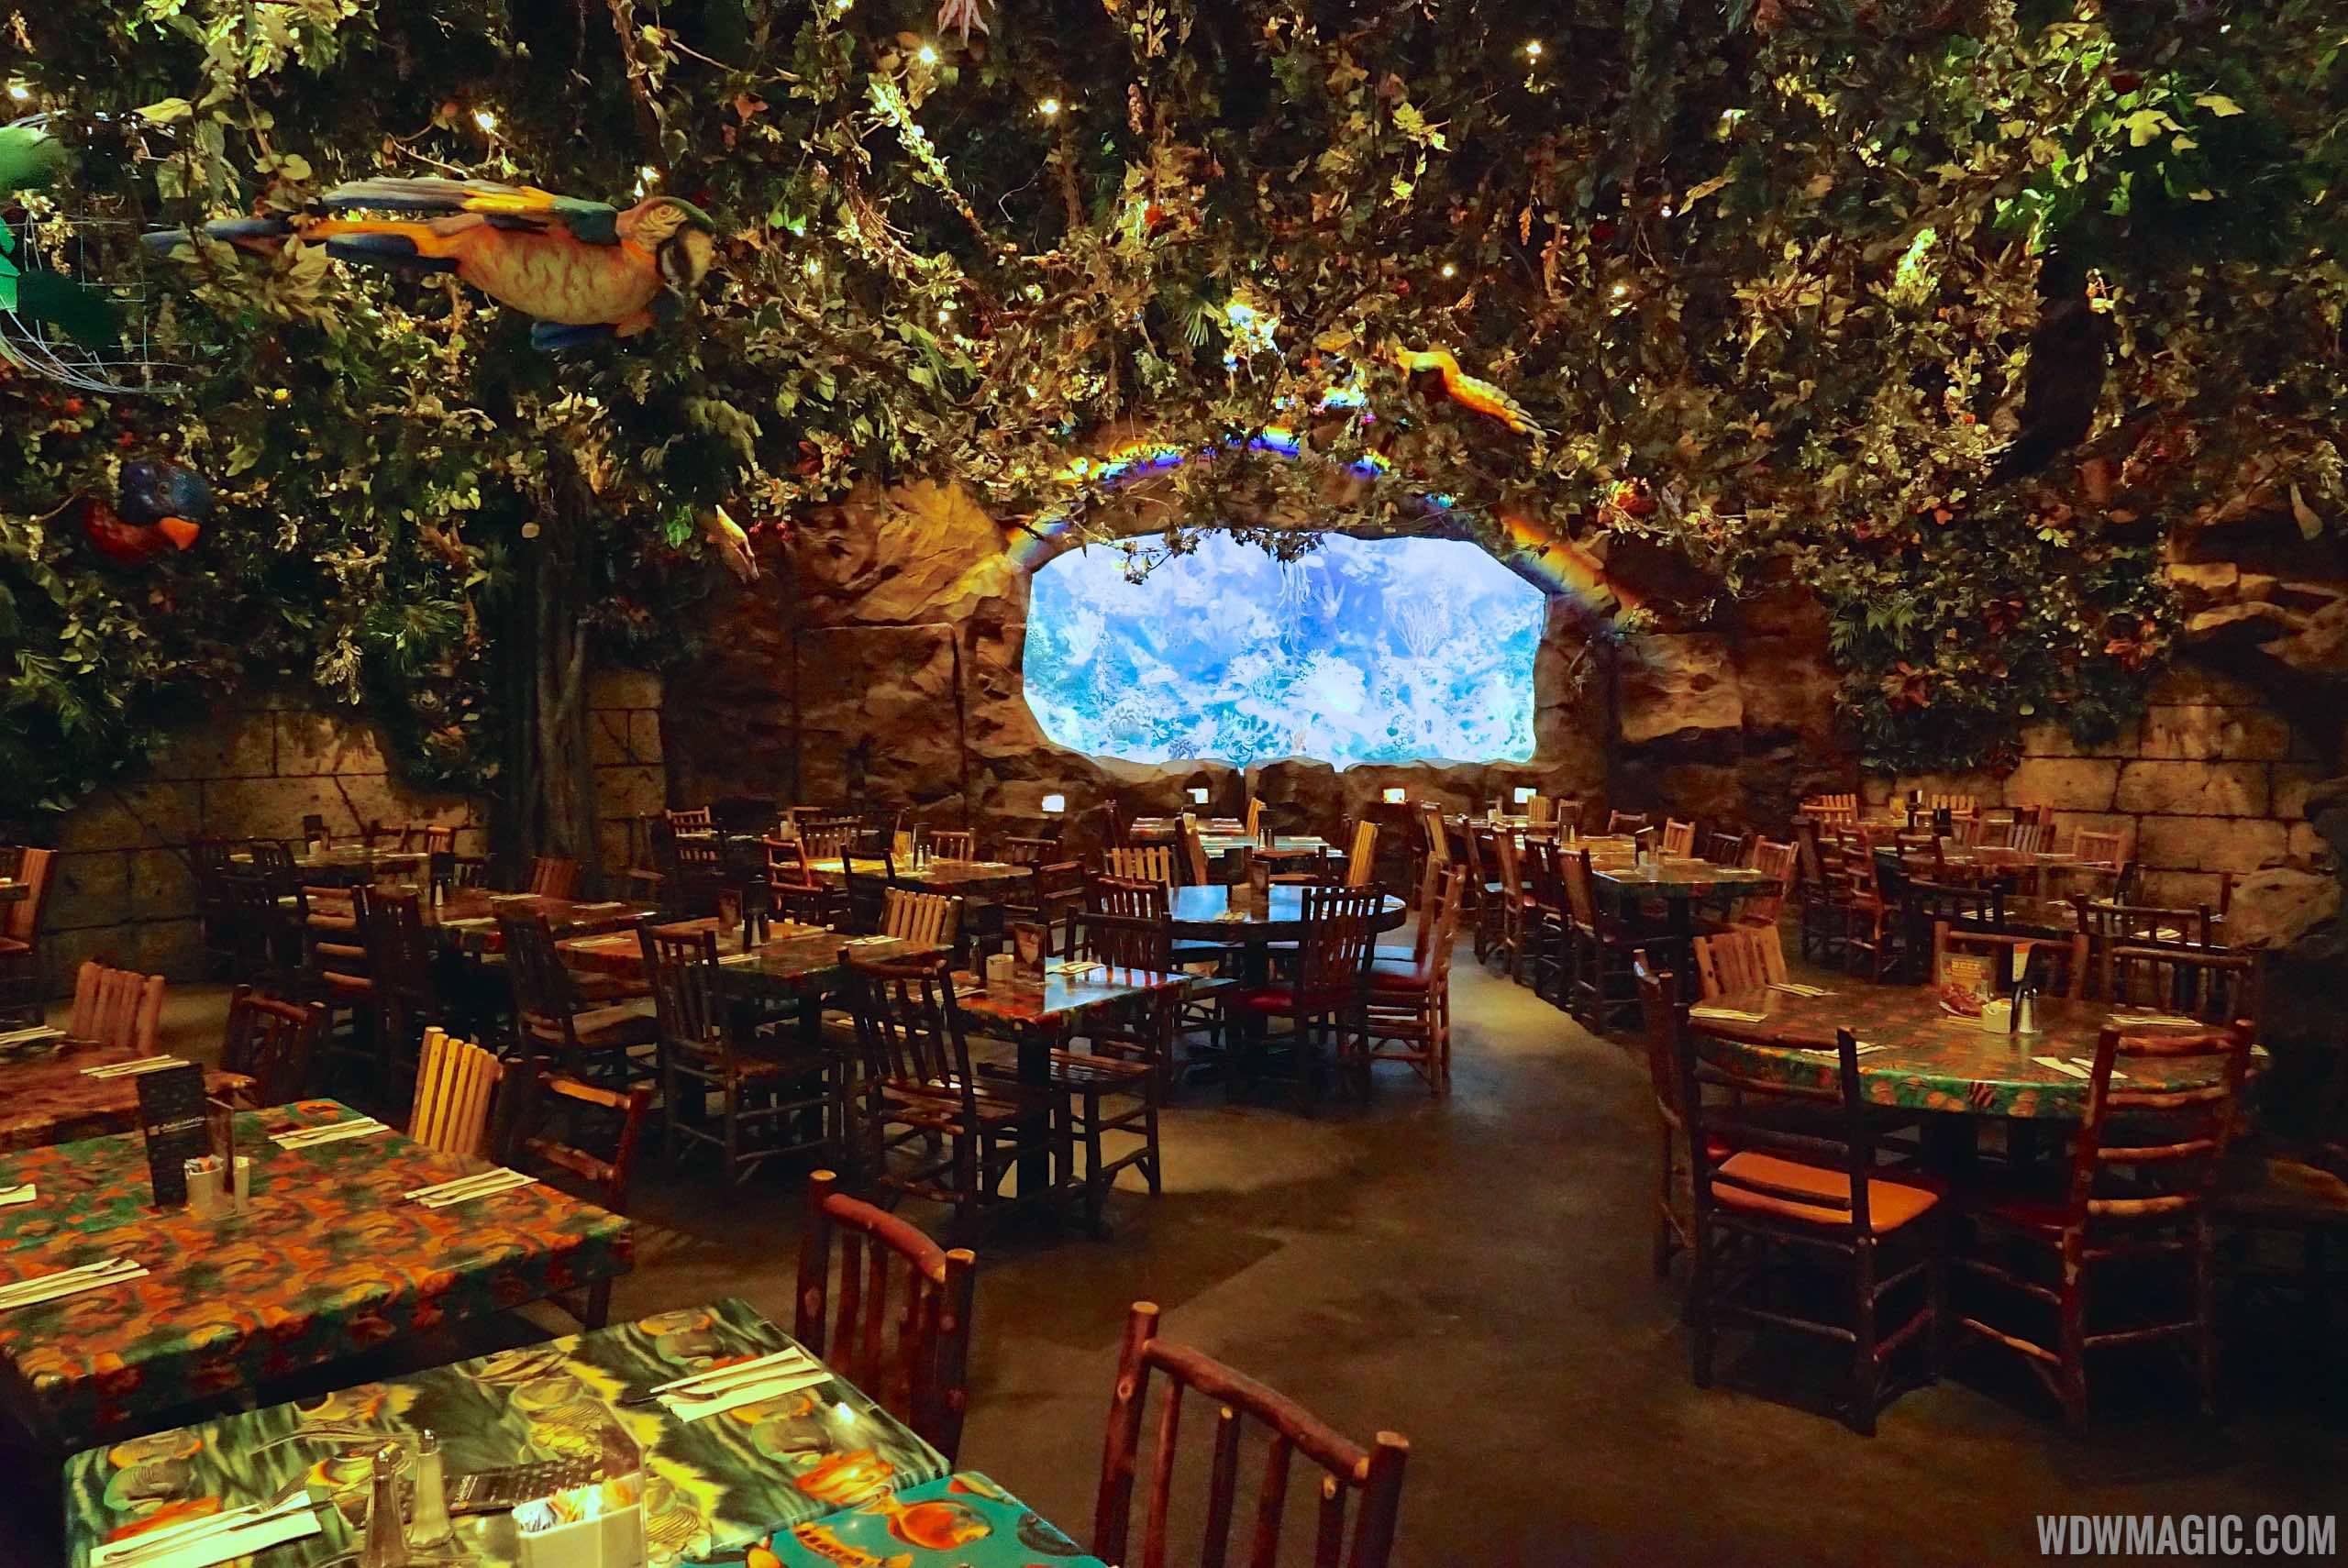 Rainforest Cafe Disney's Animal Kingdom overview